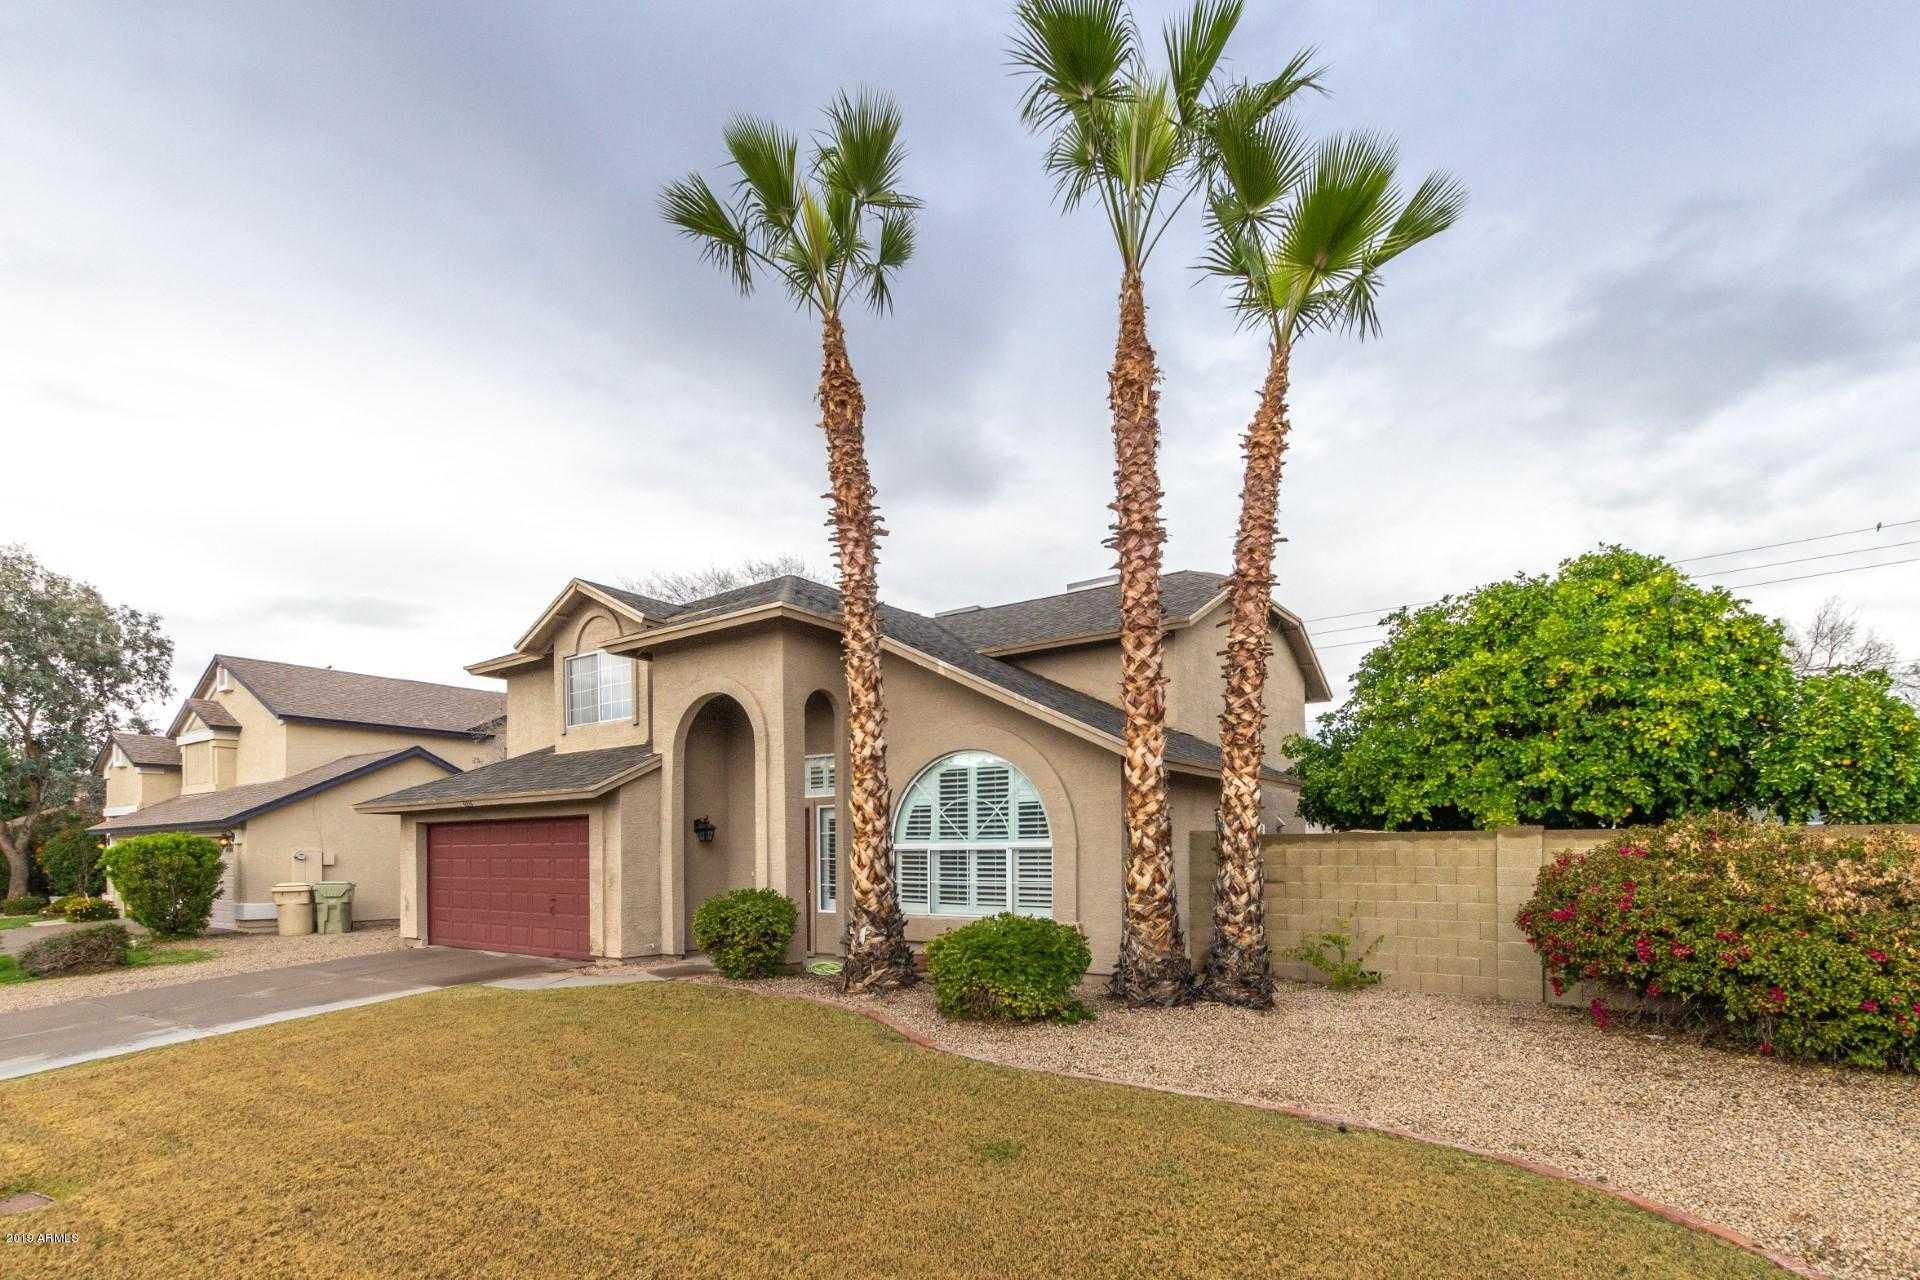 $329,900 - 4Br/3Ba - Home for Sale in San Miguel Unit 2 Lot 1-255, Glendale